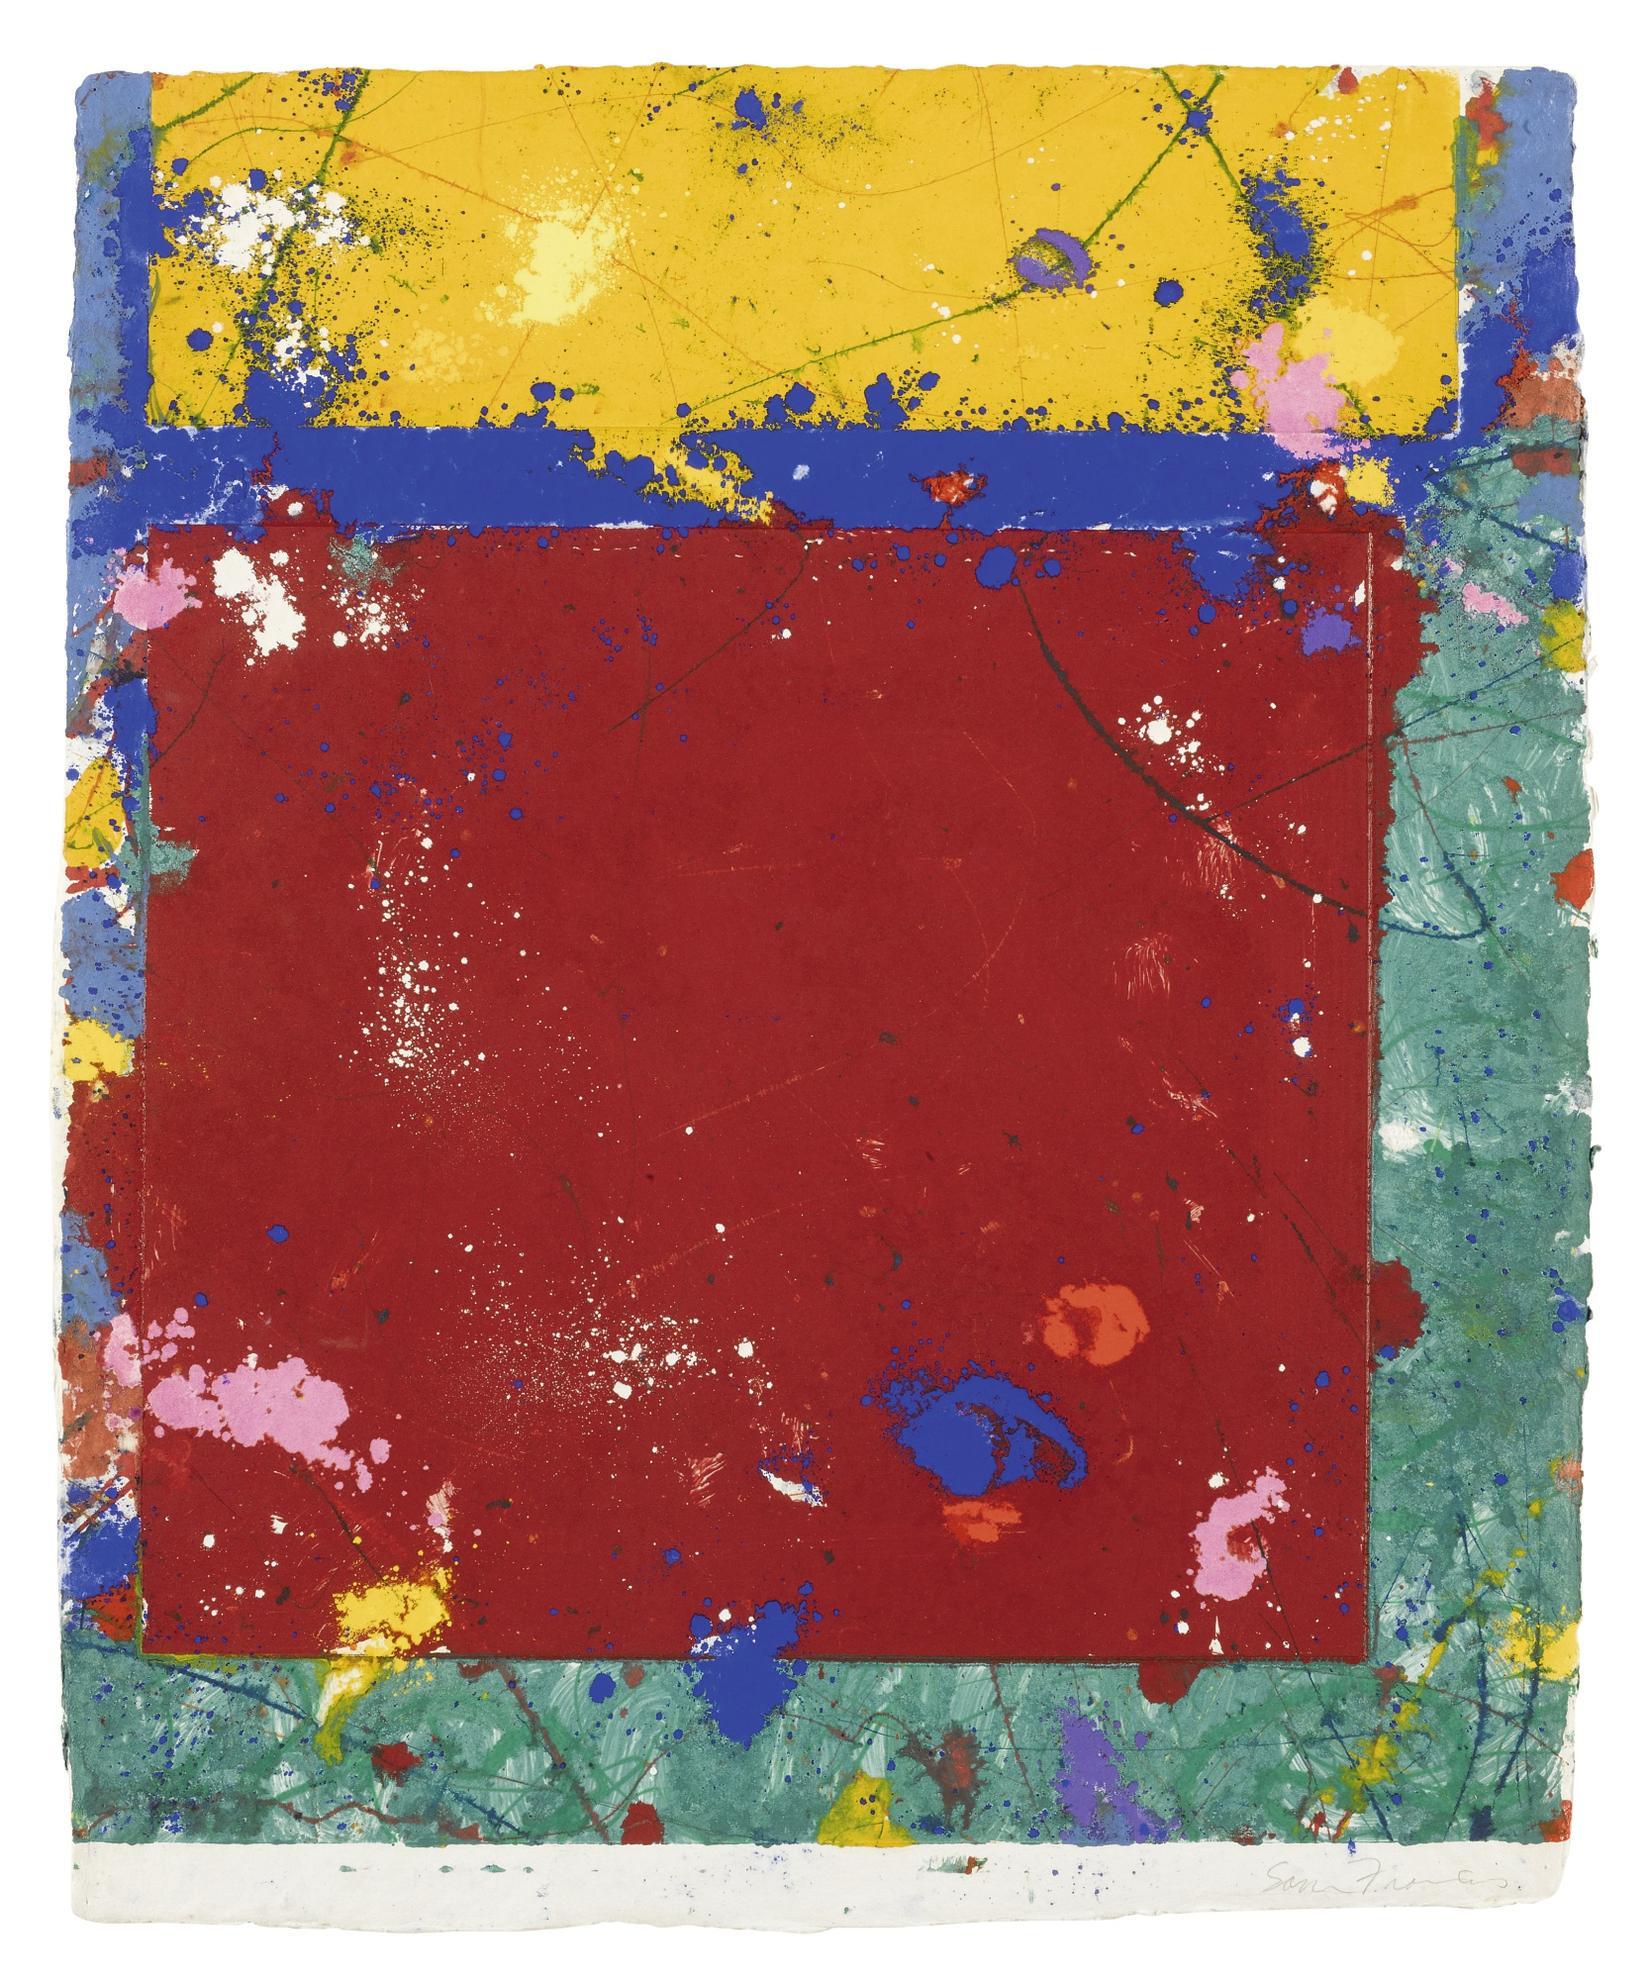 Sam Francis-Untitled (Sfm 81-021)-1981